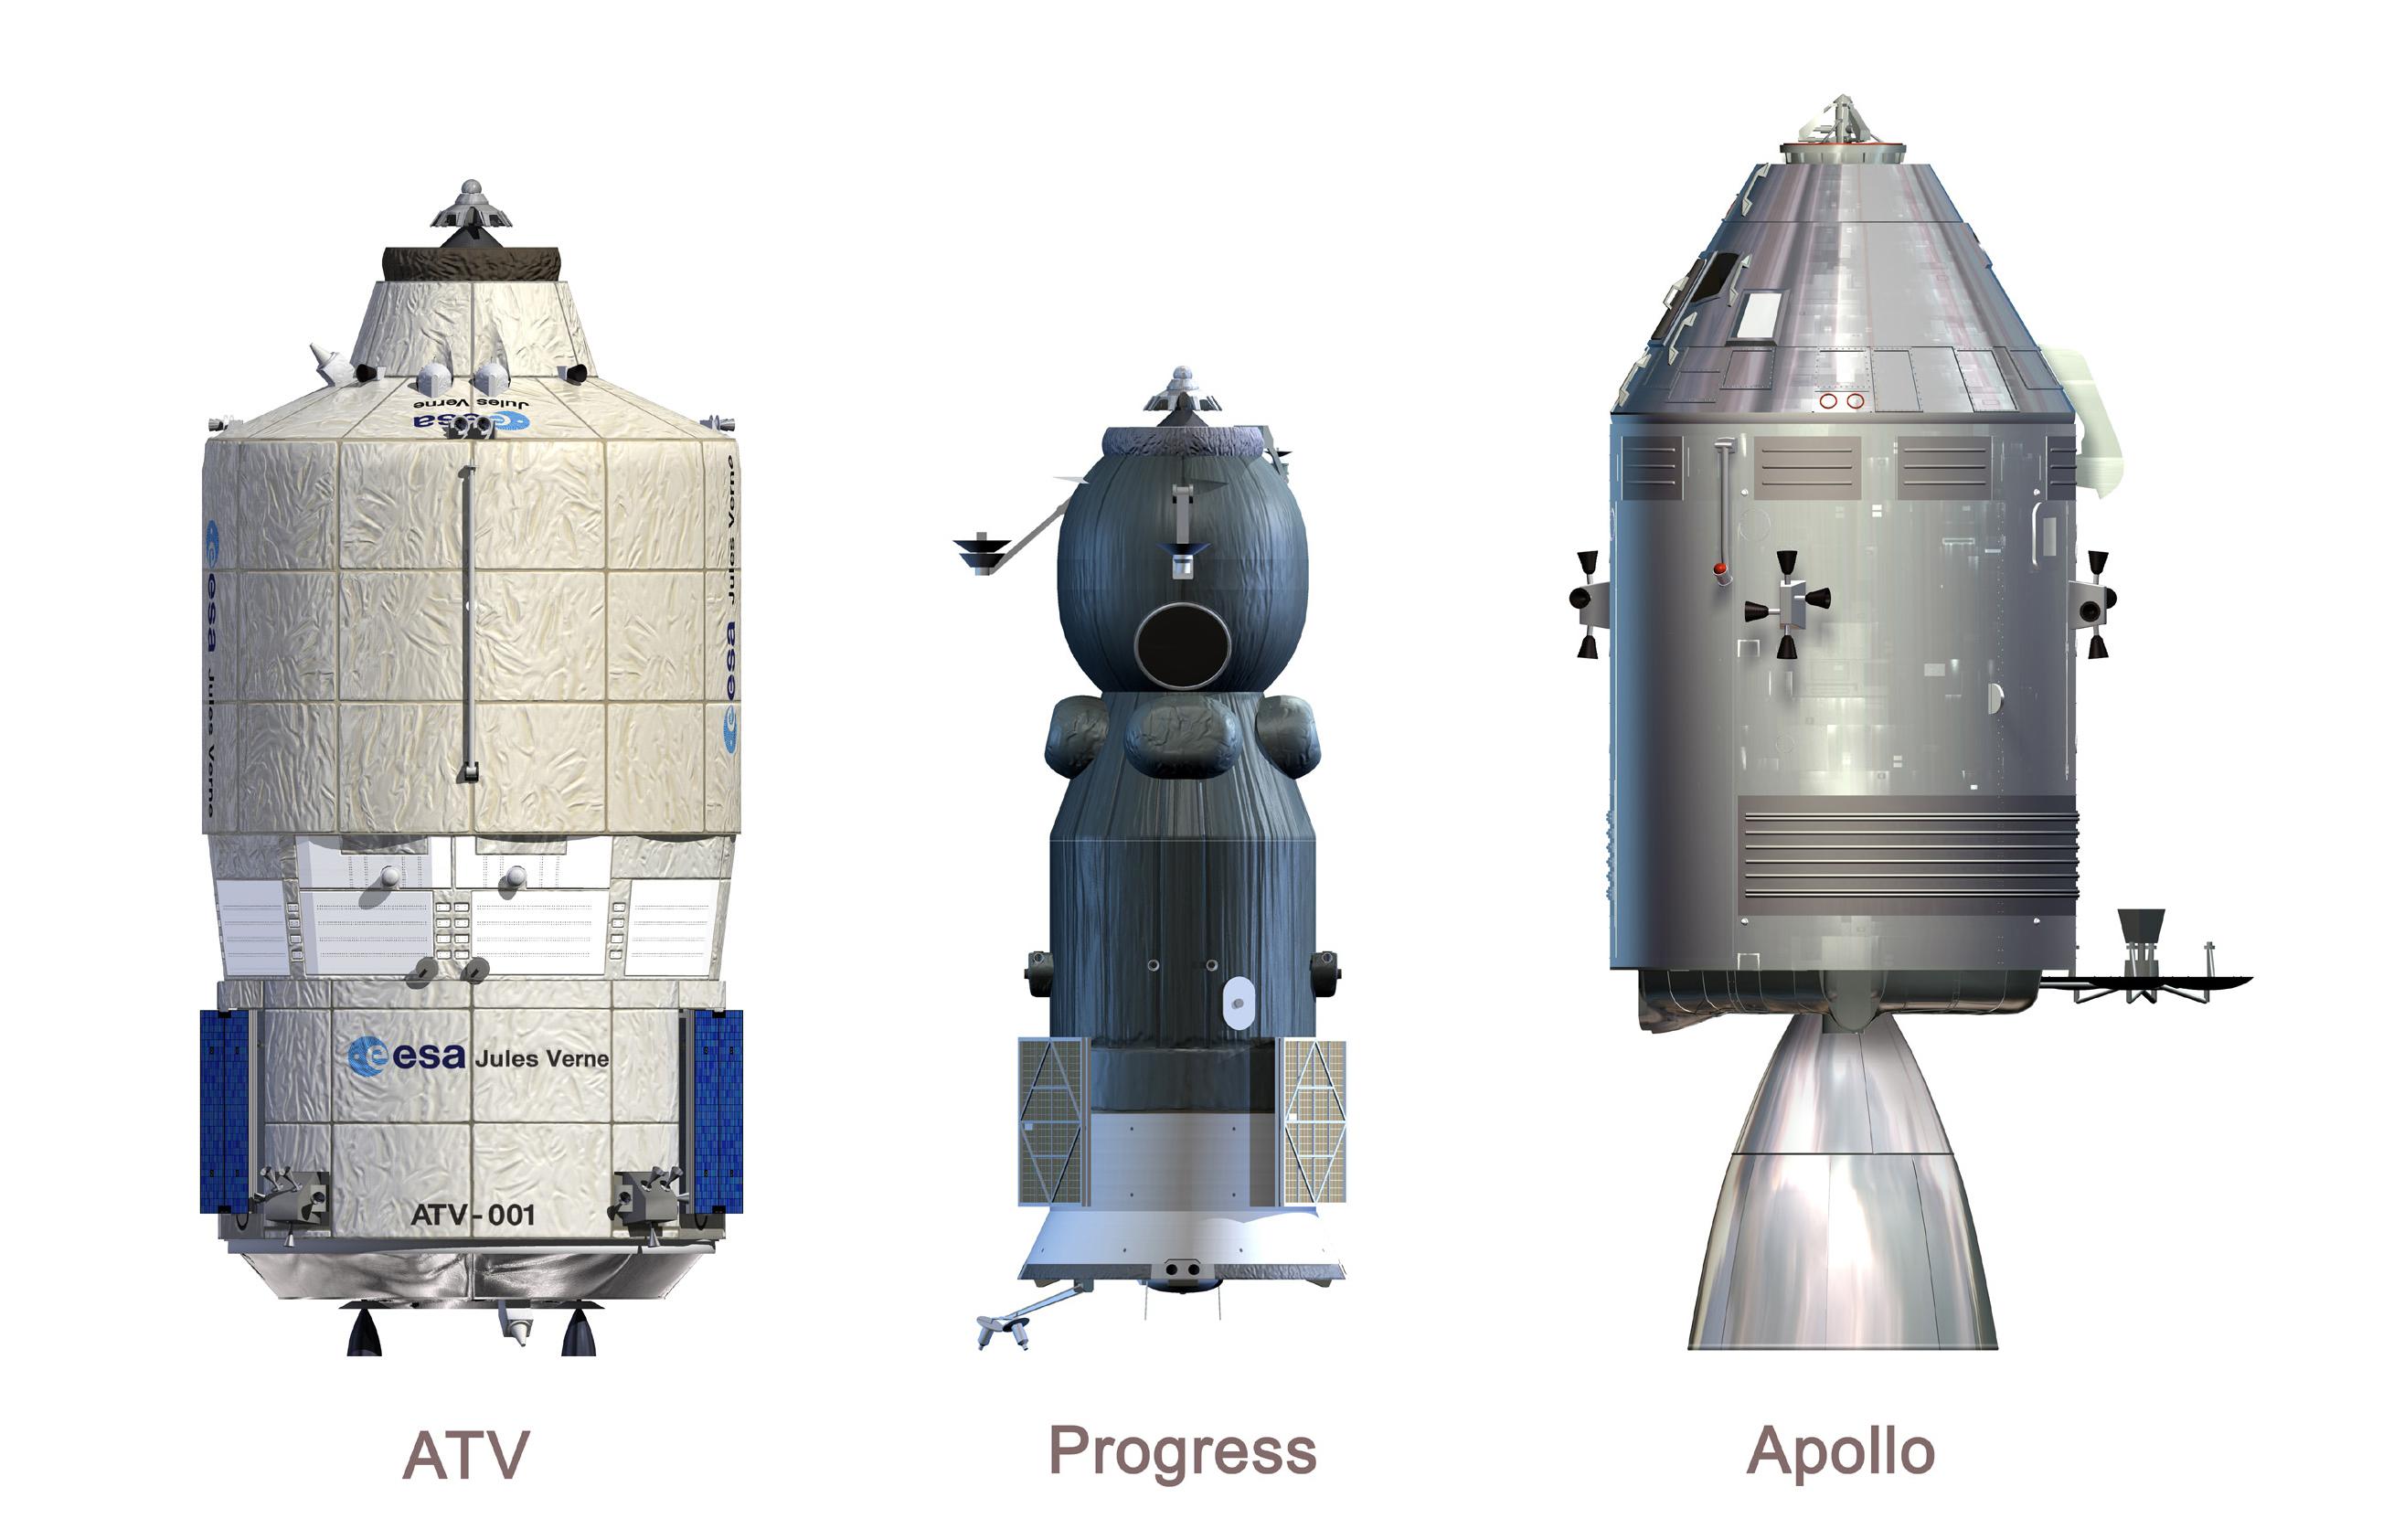 apollo spacecraft - photo #28